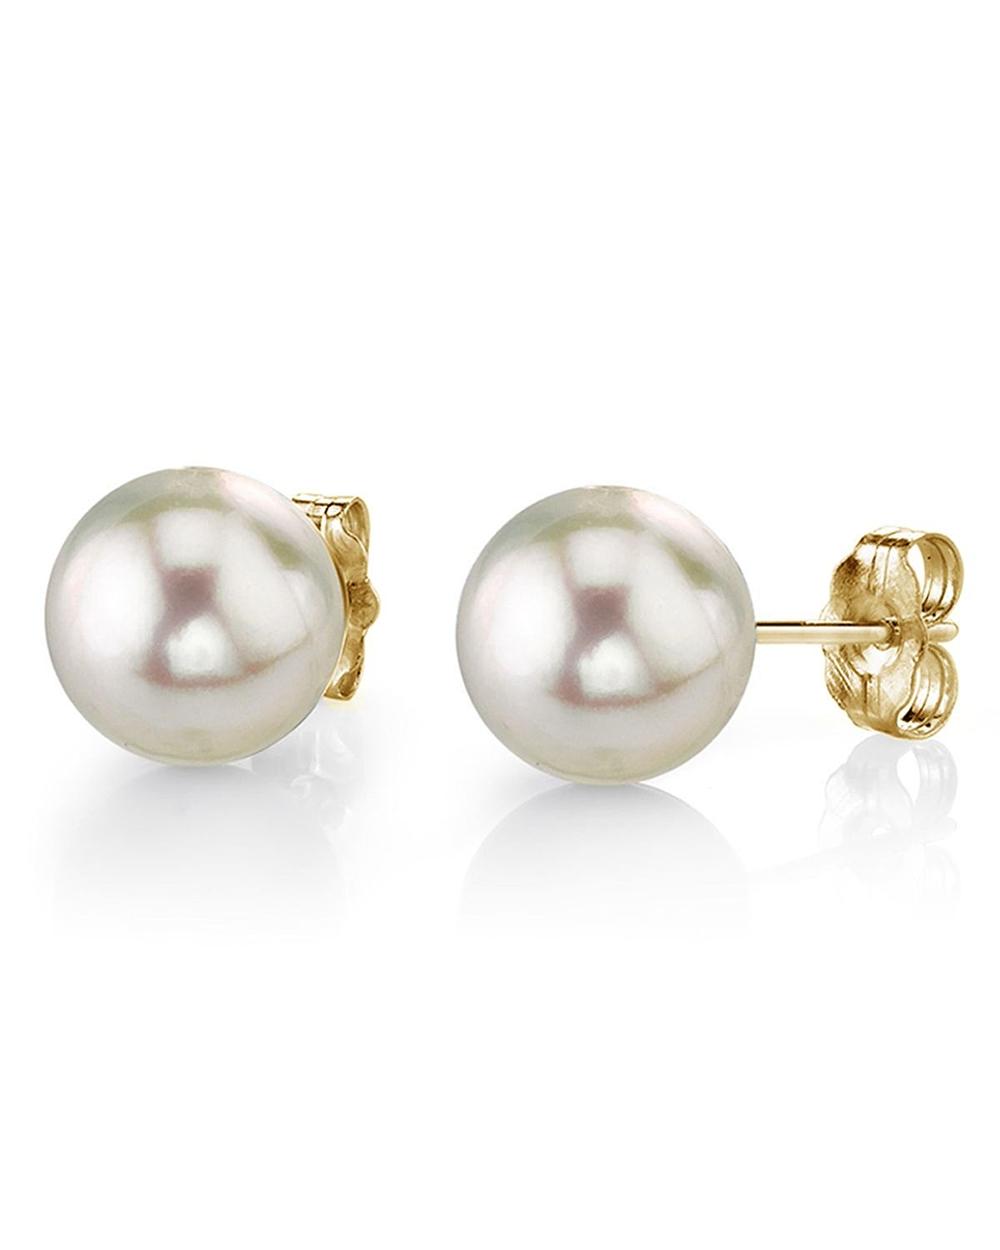 9 0 5mm White Akoya Pearl Stud Earrings